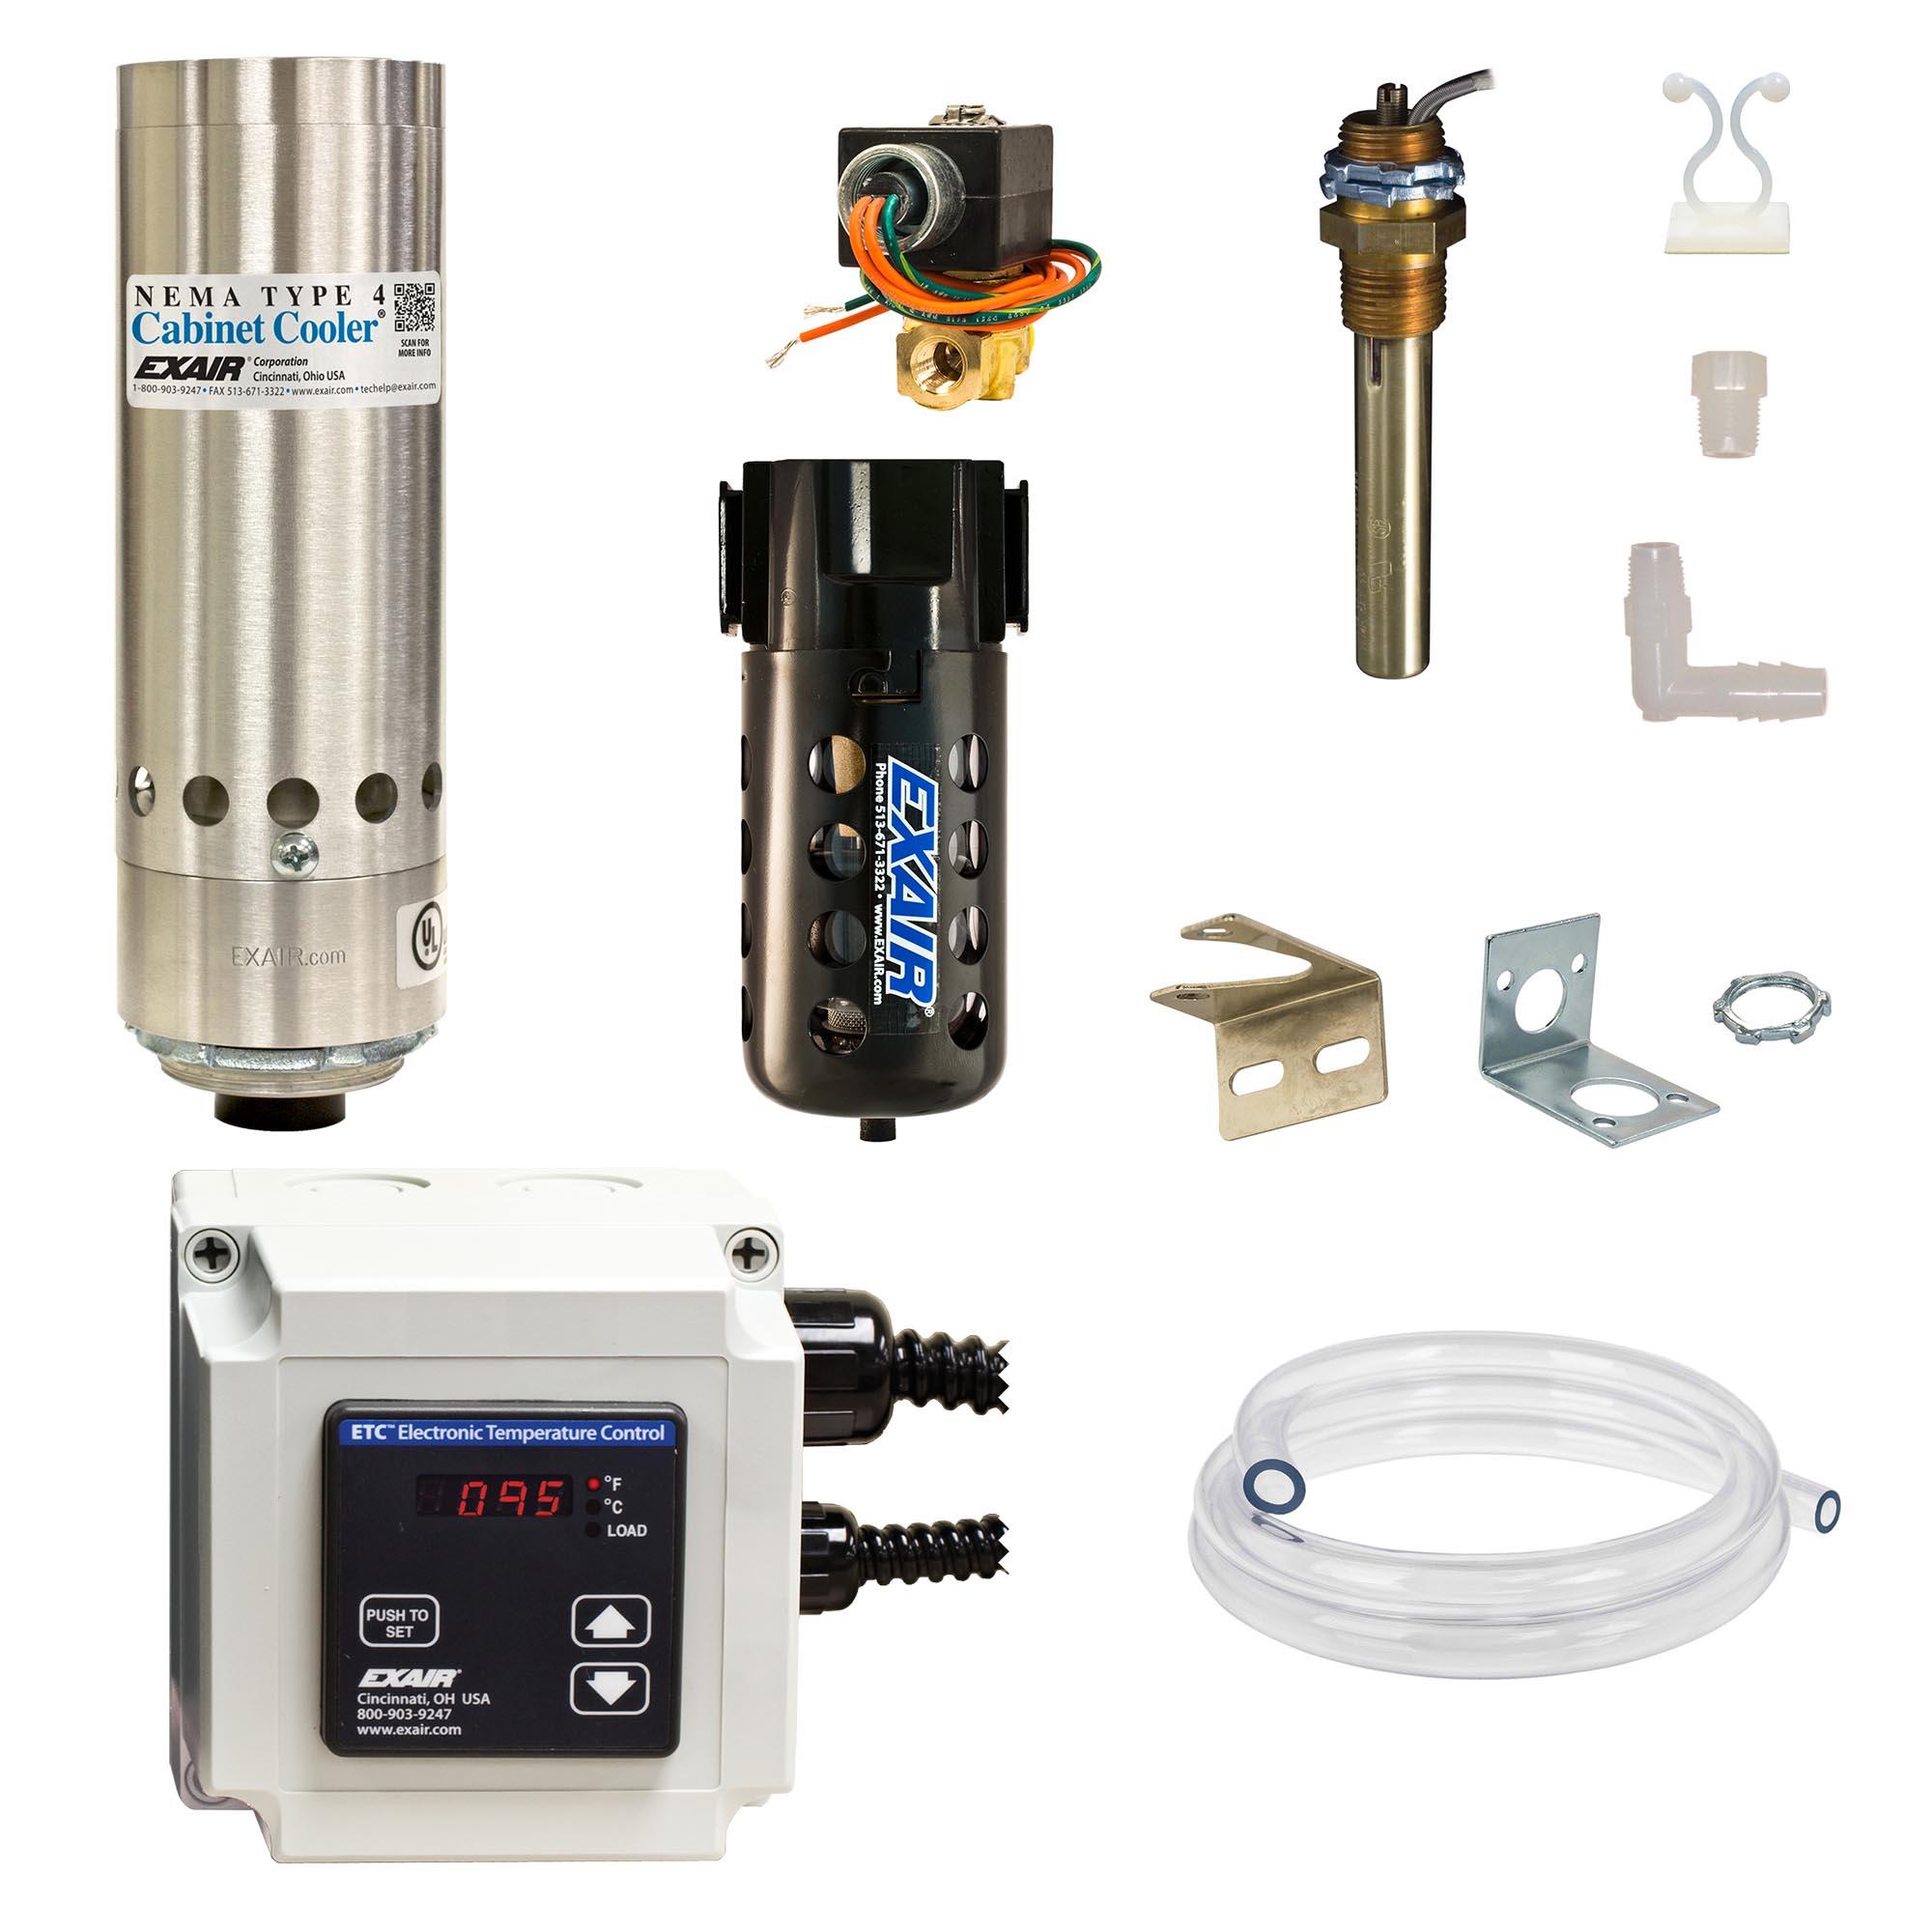 Model W4815-ETC120 NEMA 4 1,000 Btu/hr Cabinet Cooler System with ETC Thermostat Control, 120V